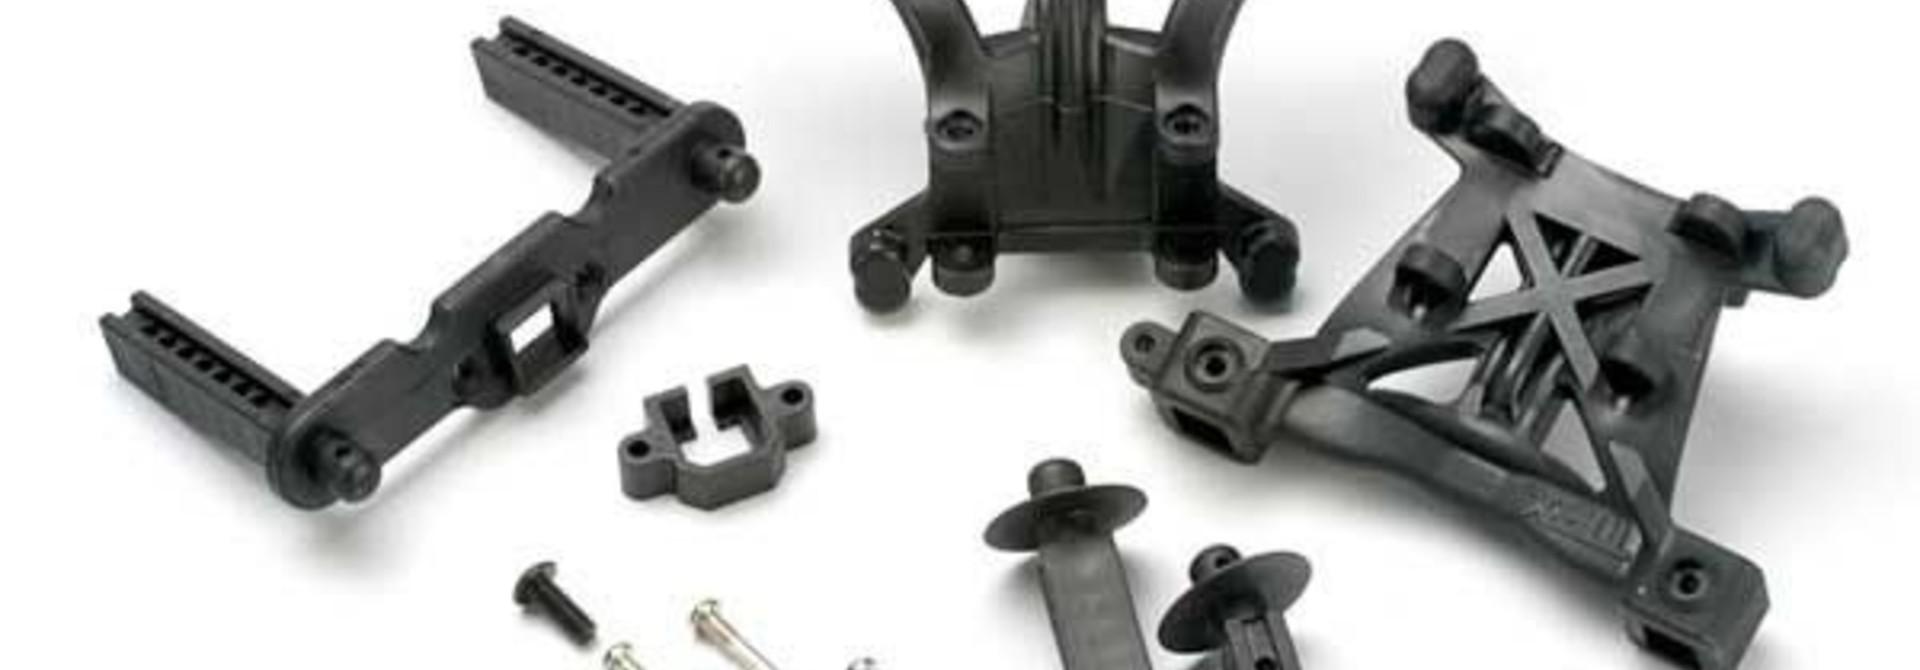 Body mounts, front & rear/ body mount posts, front & rear/ 2, TRX5314